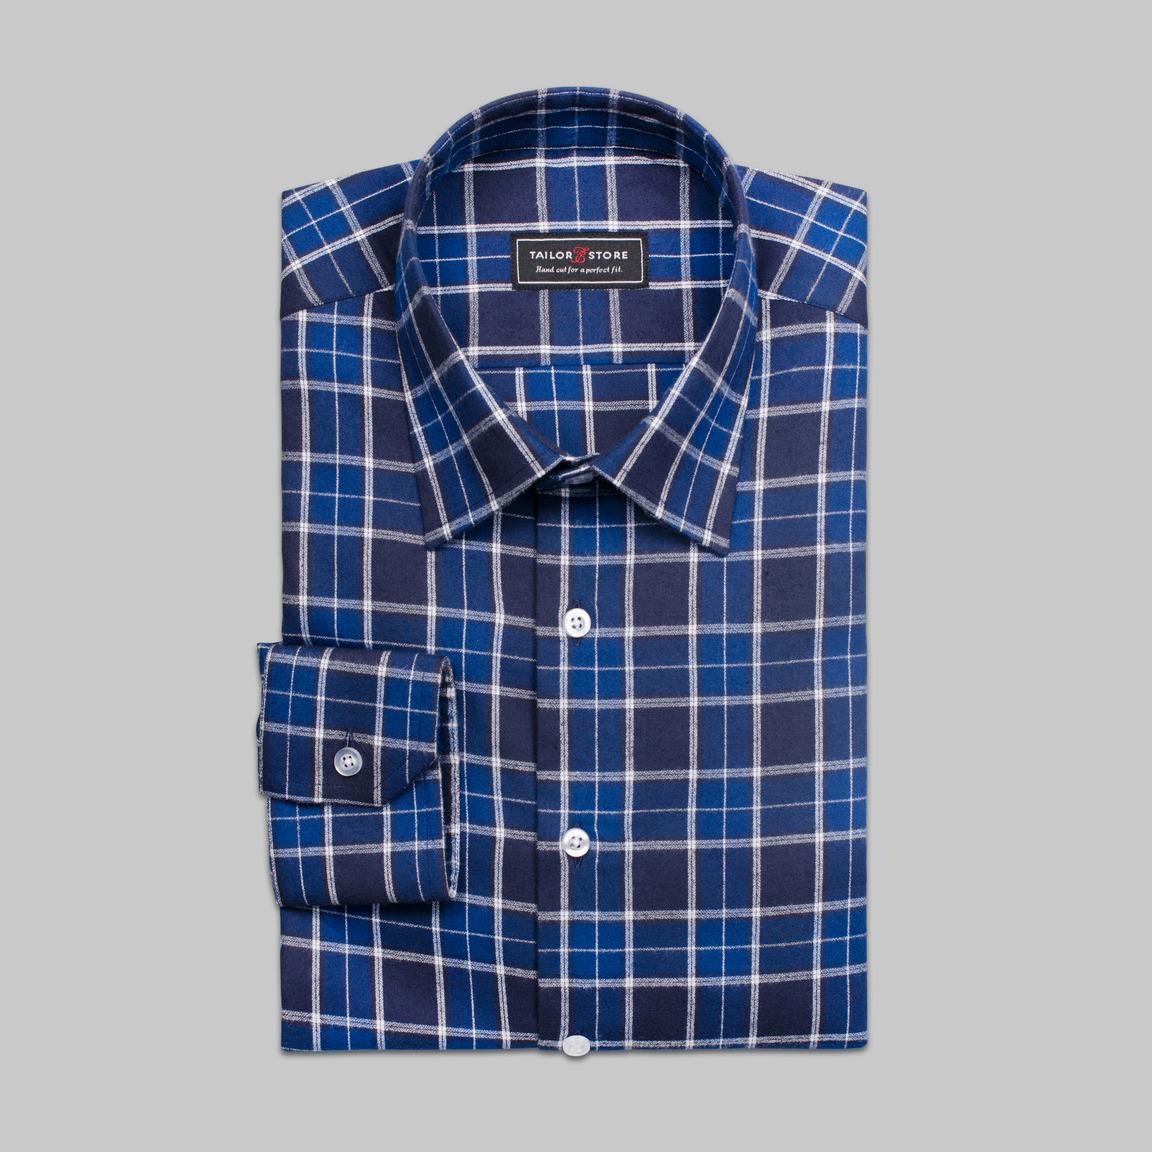 Tartan checked dress shirt in navy/black/white